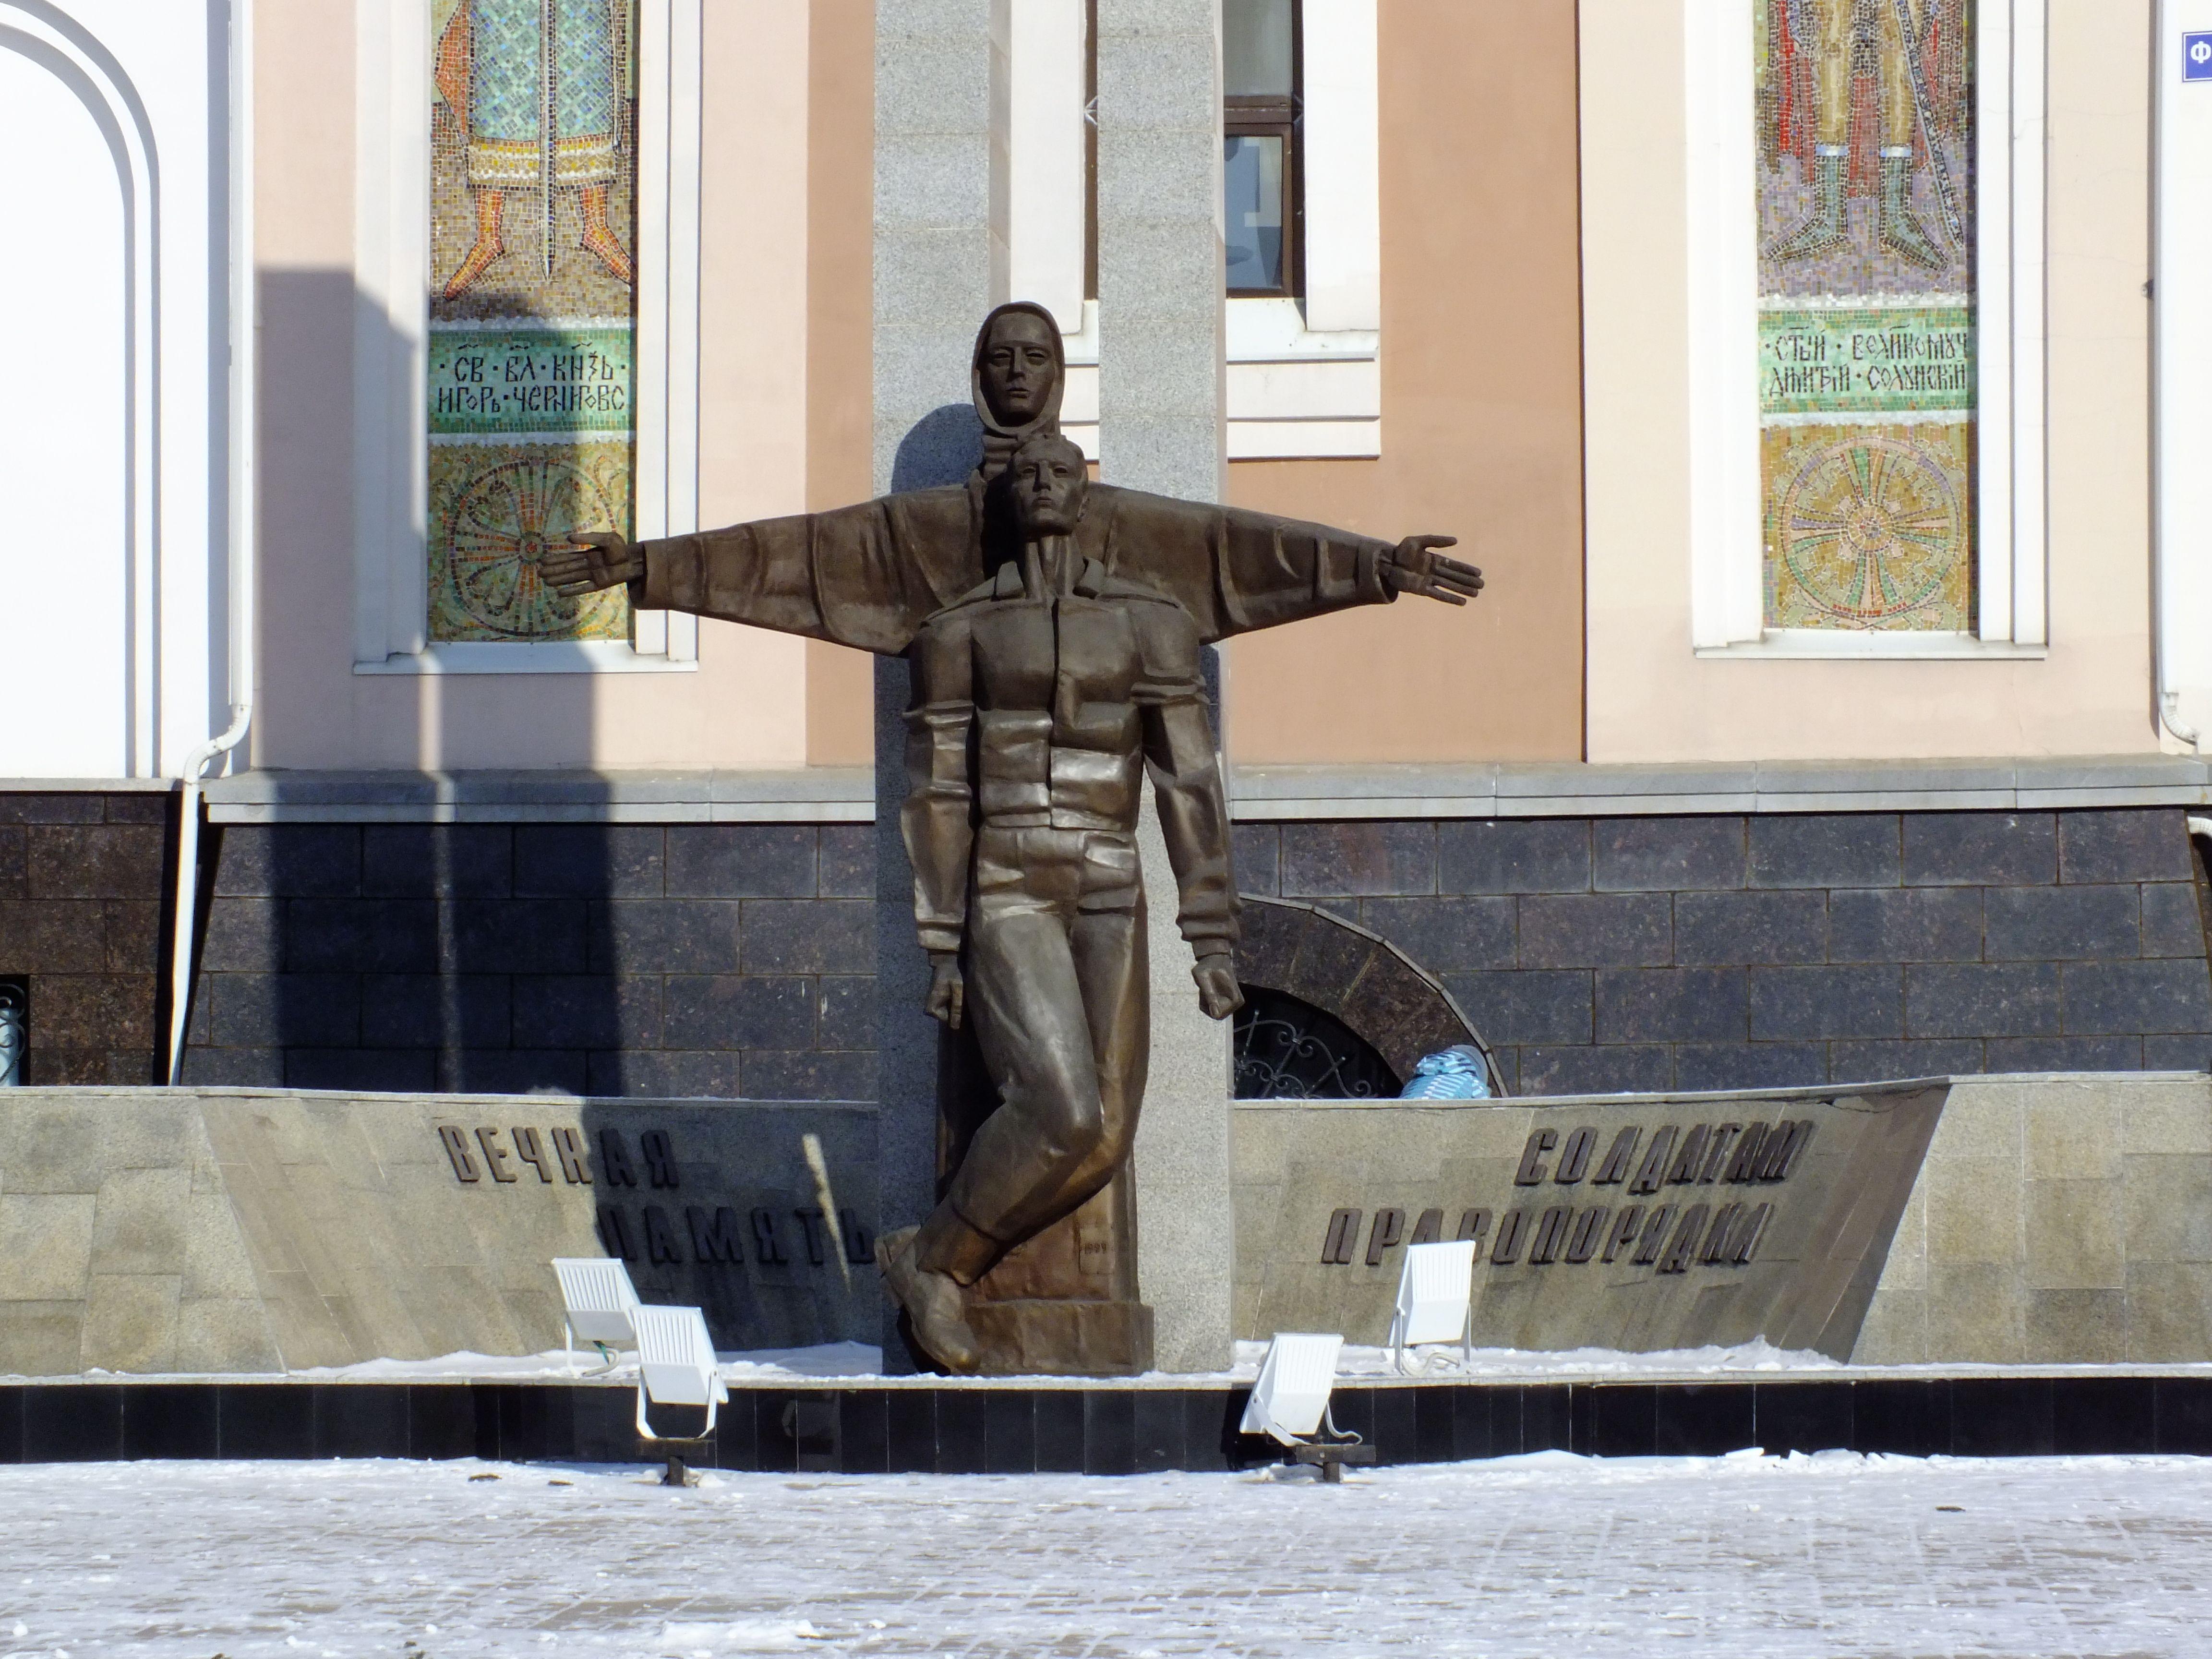 памятники владивостока фото с описанием любят